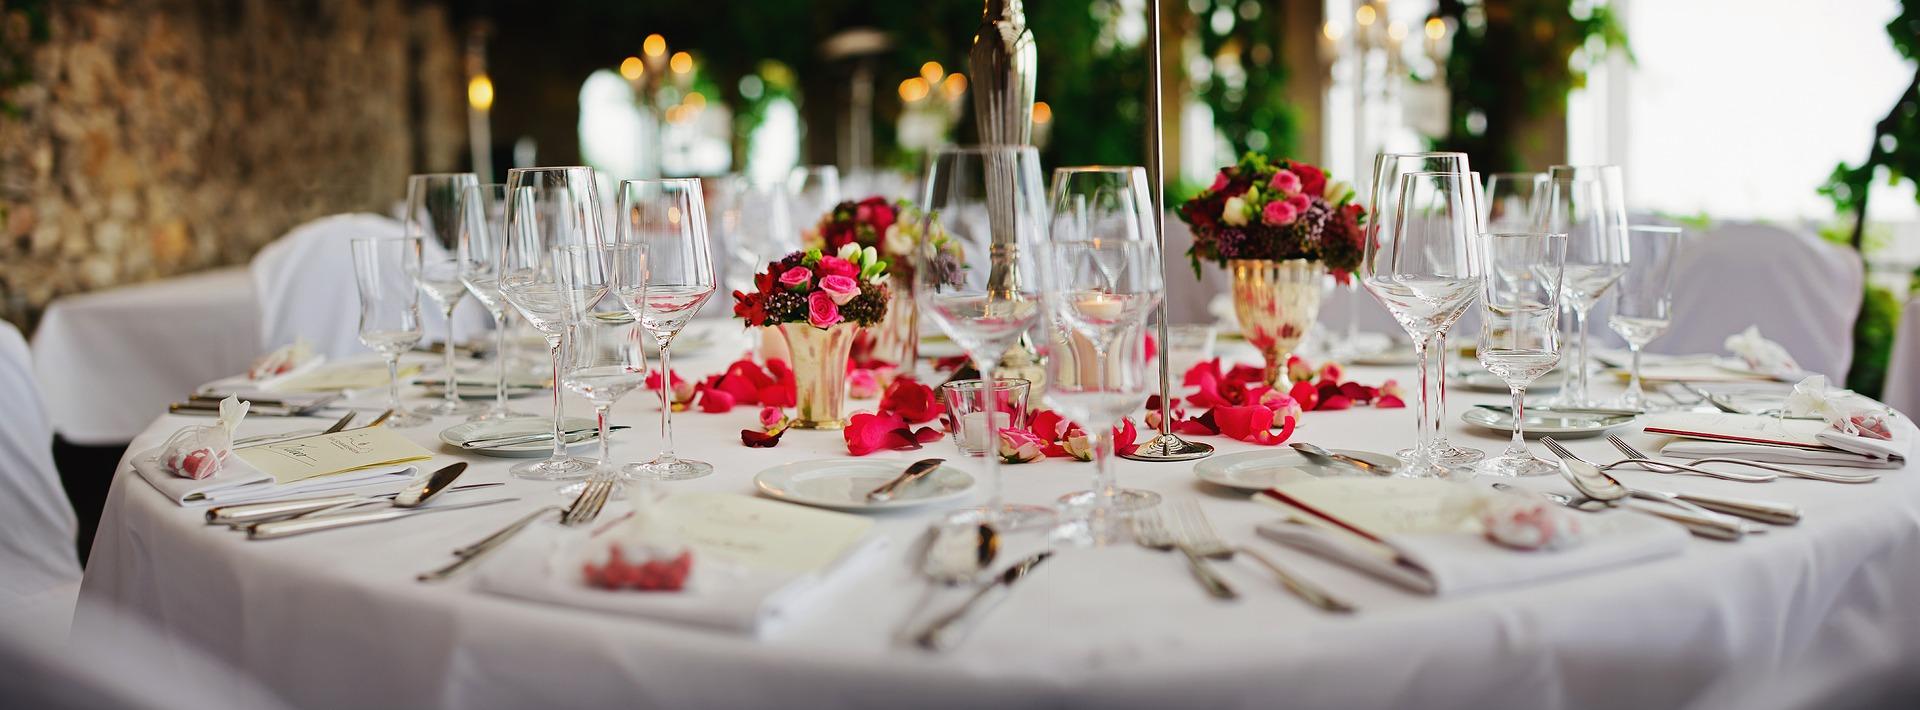 luxury wedding tables cape